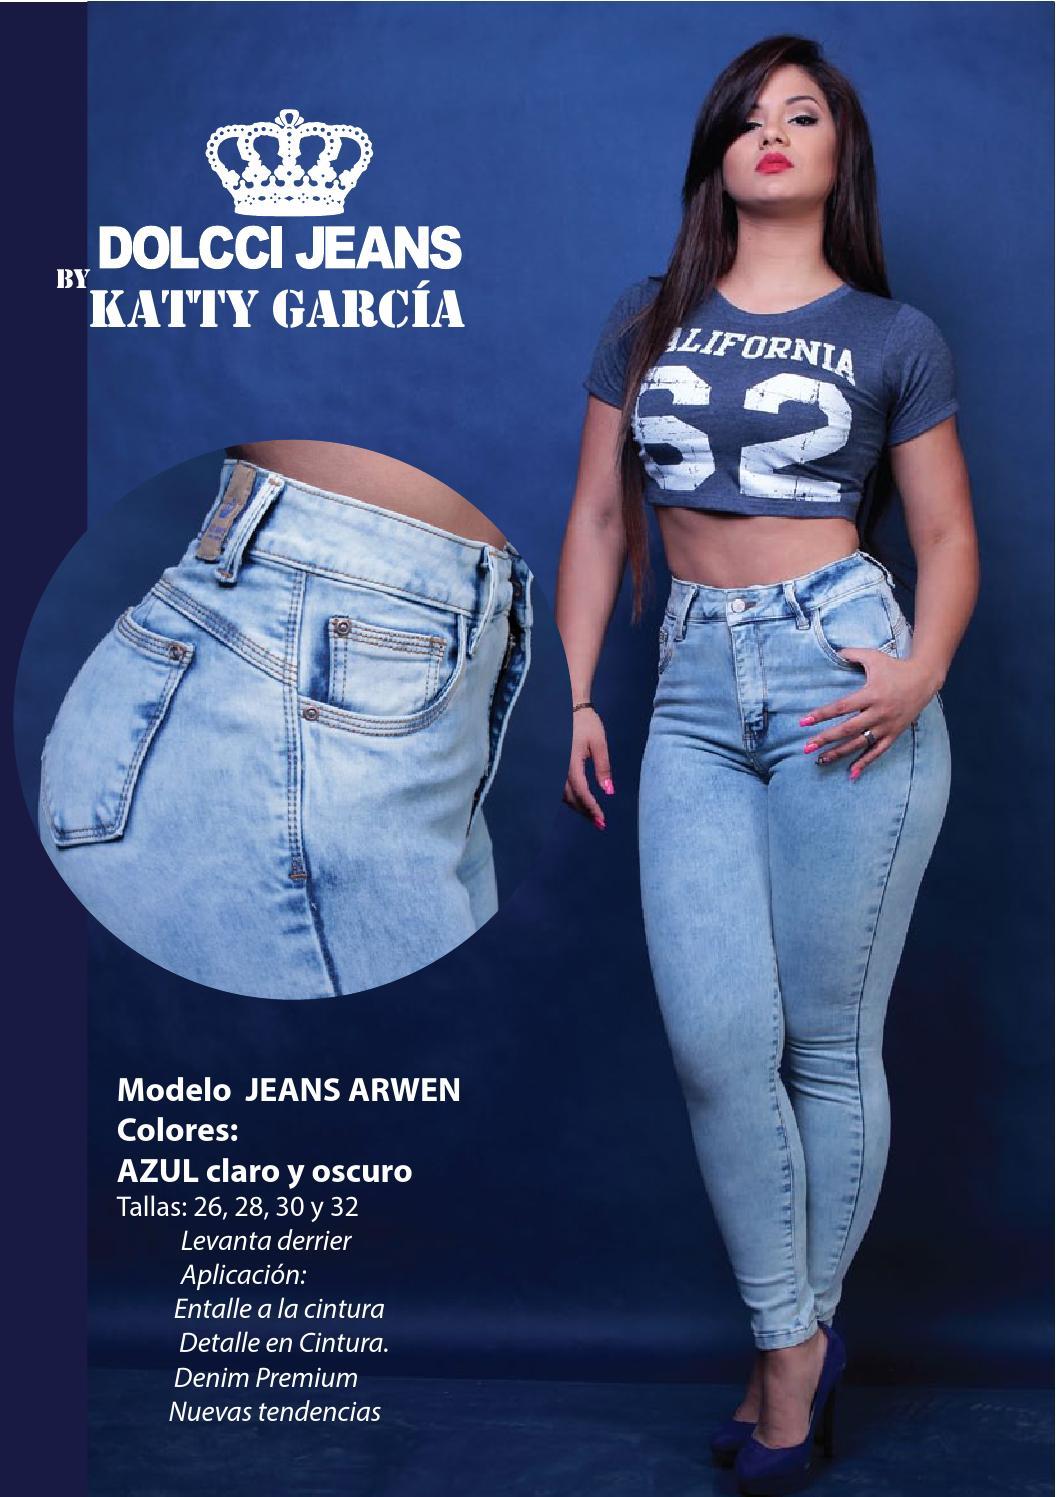 Nueva Colecciu00f3n Verano 2016 by Dolcci Jeans by Katty Garcia - issuu